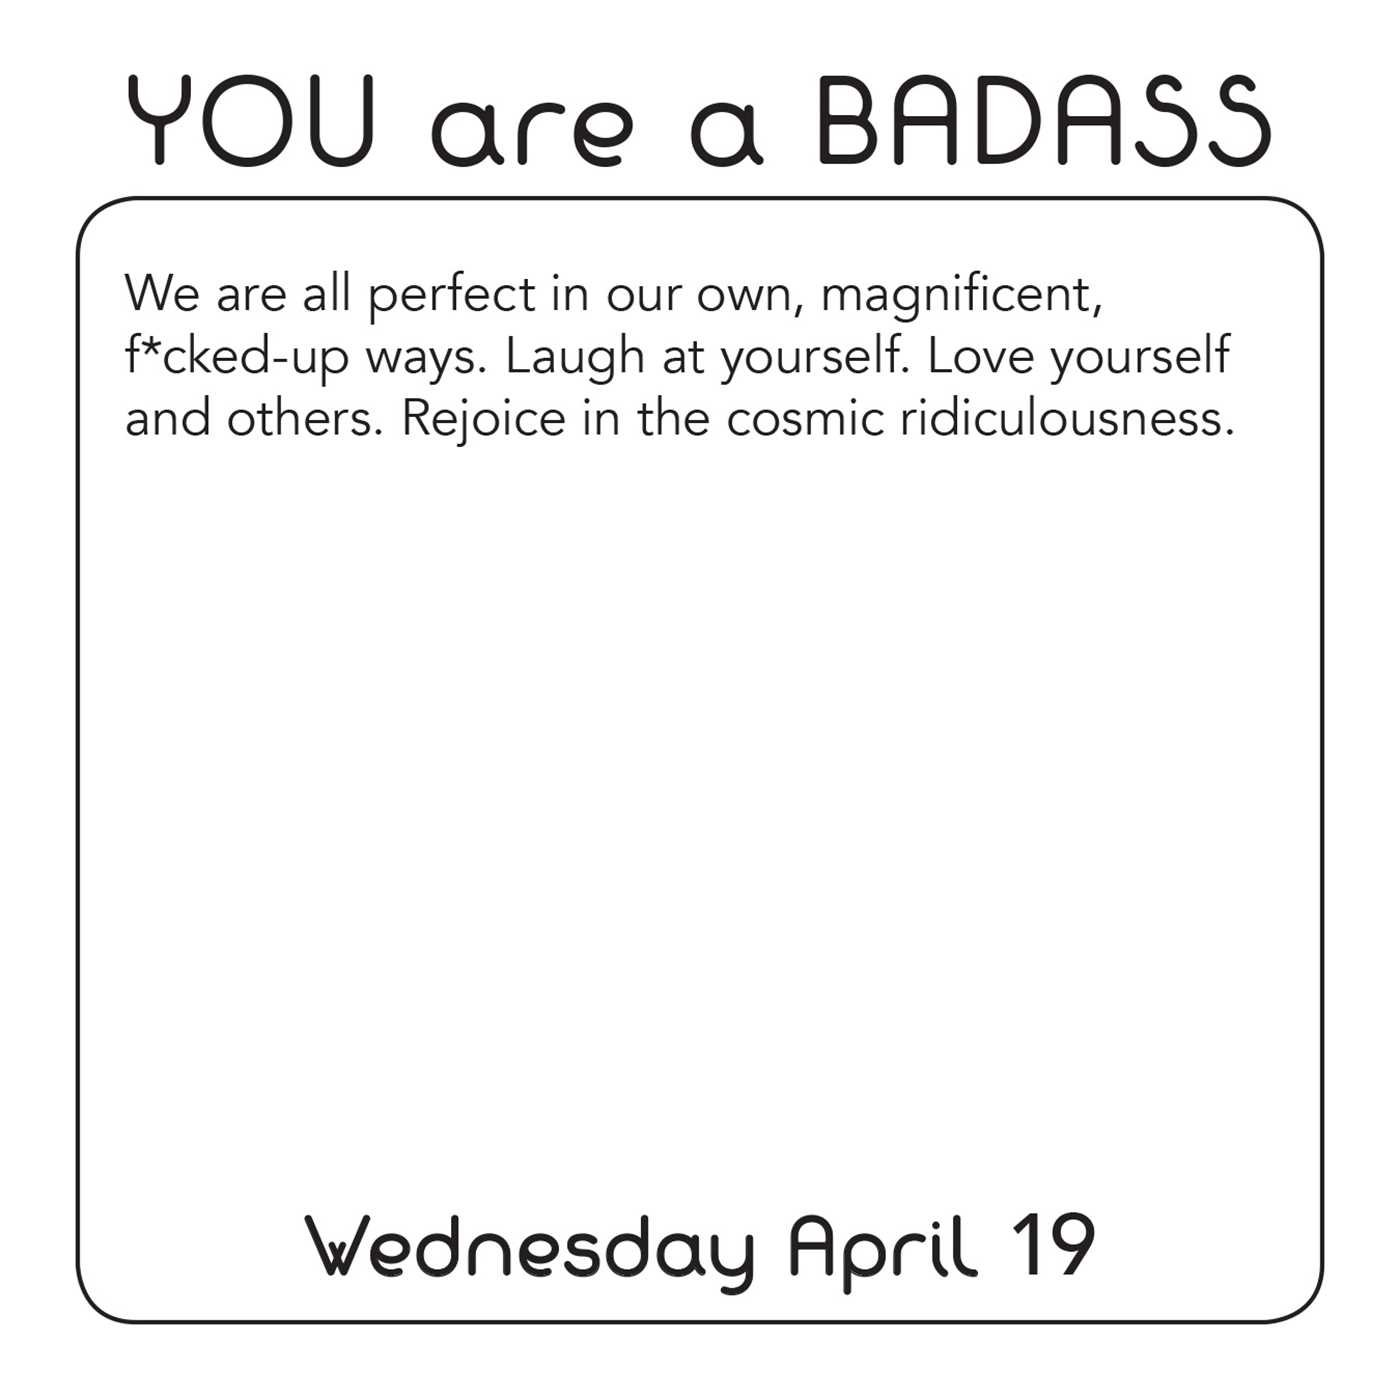 you are a badass-caitlin-elliott-inspiration-calendar